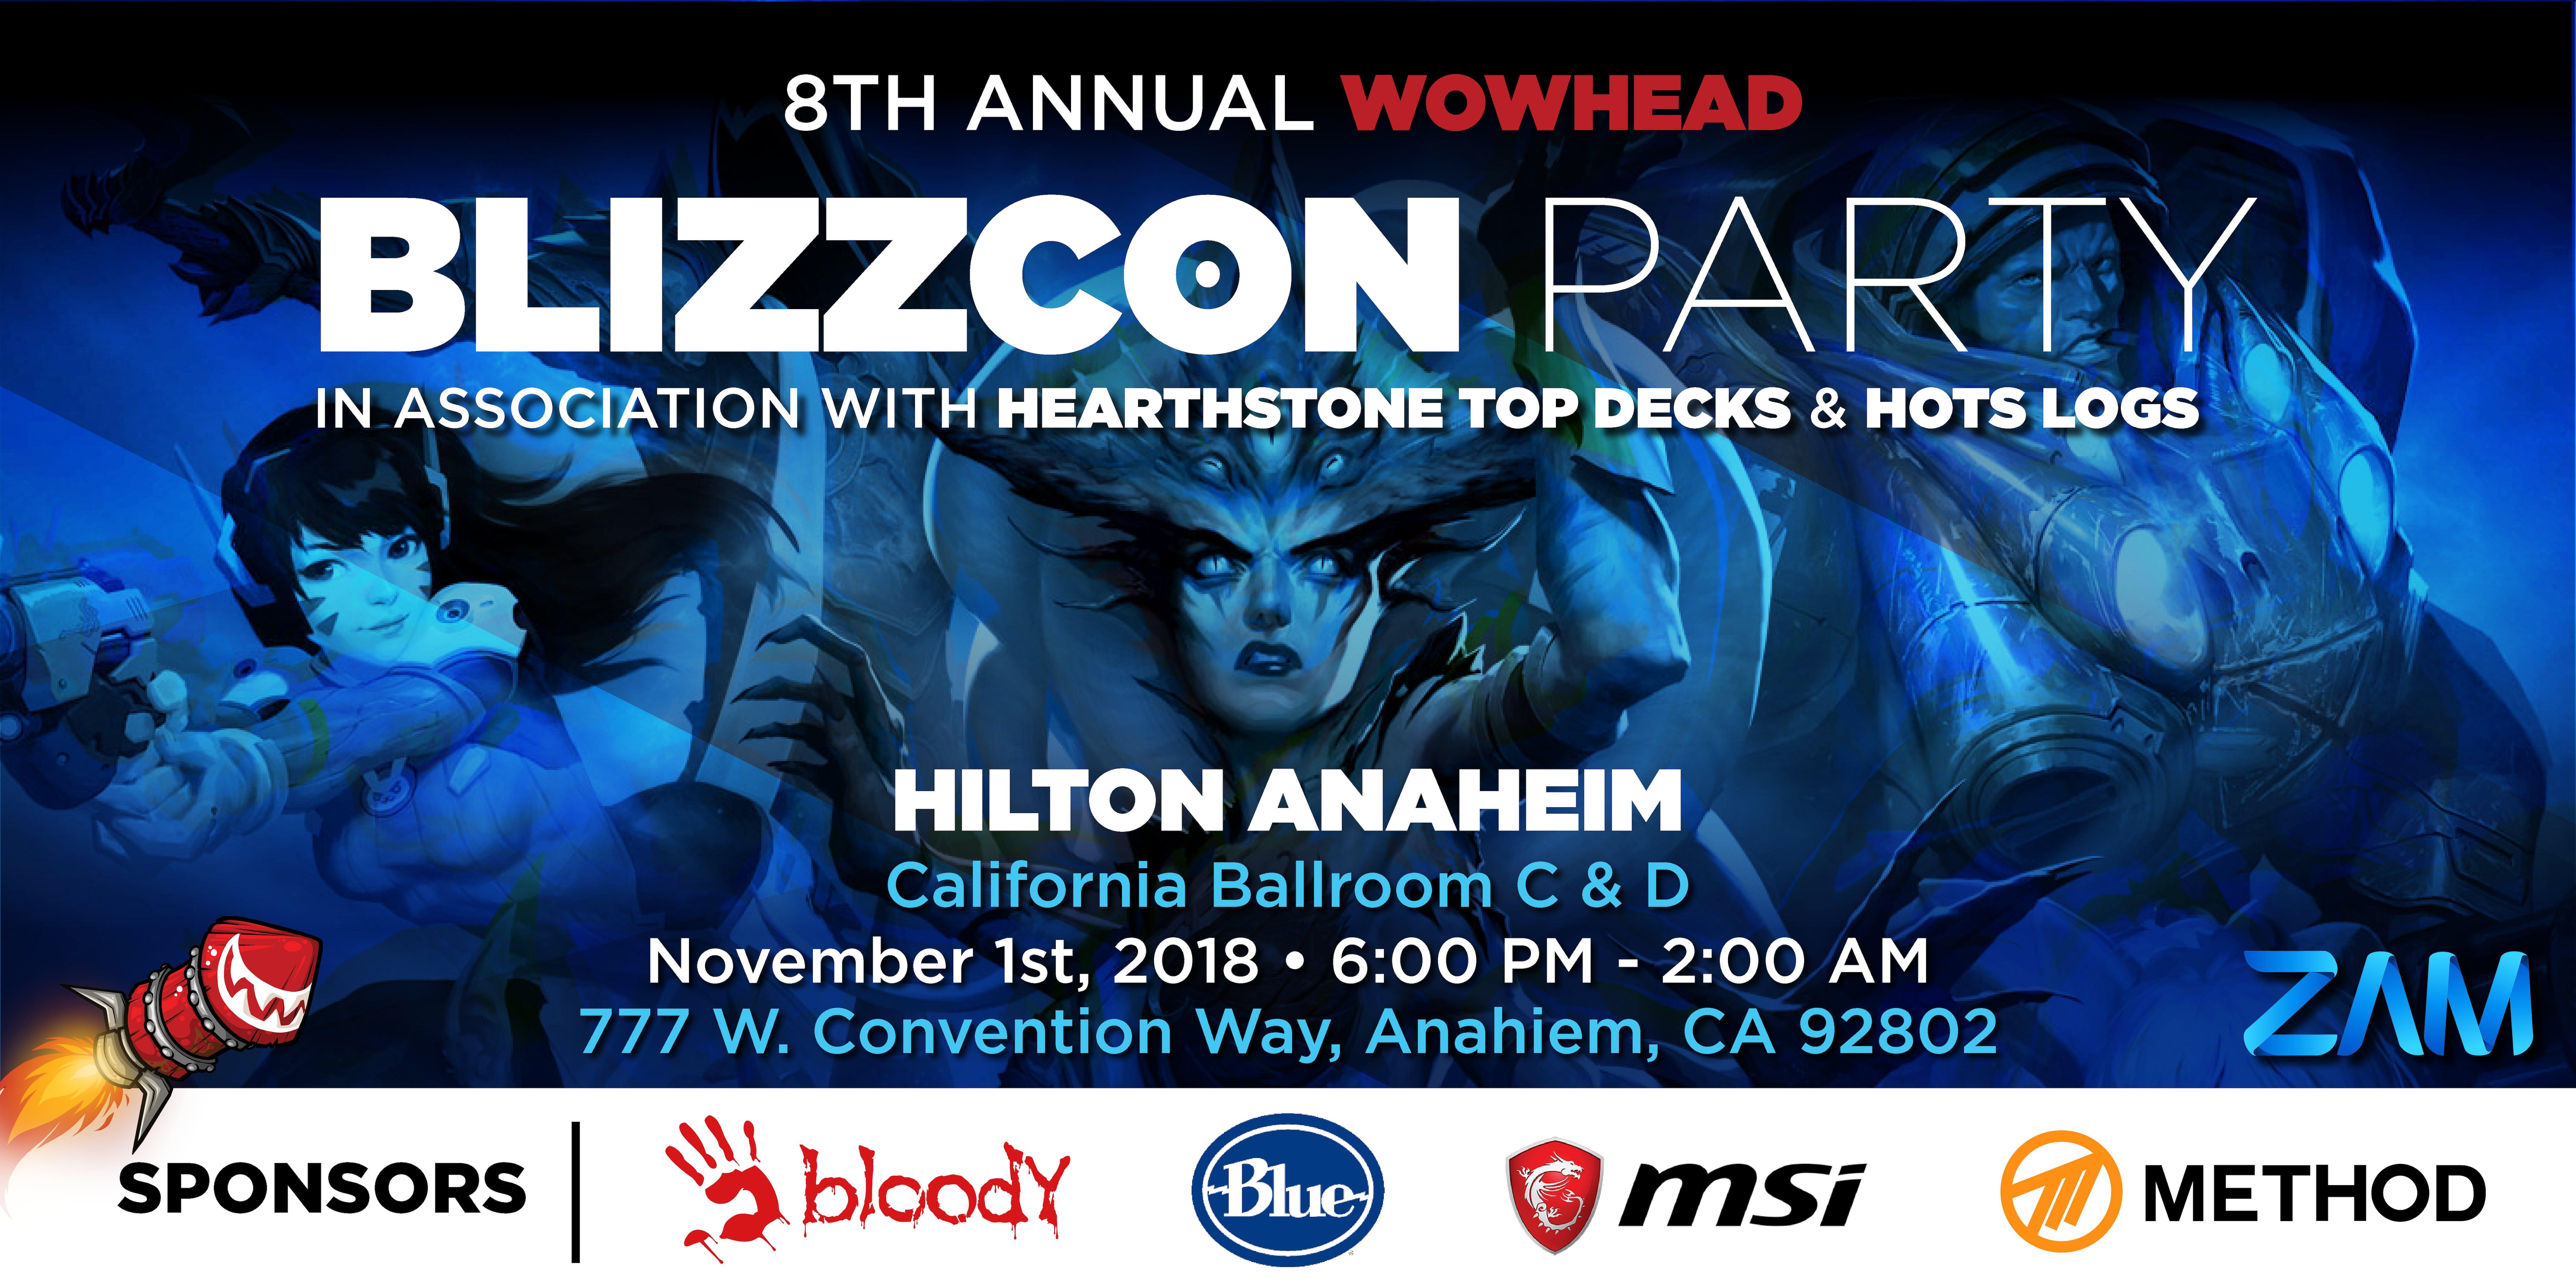 wowhead blizzcon party 2018 1 nov 2018